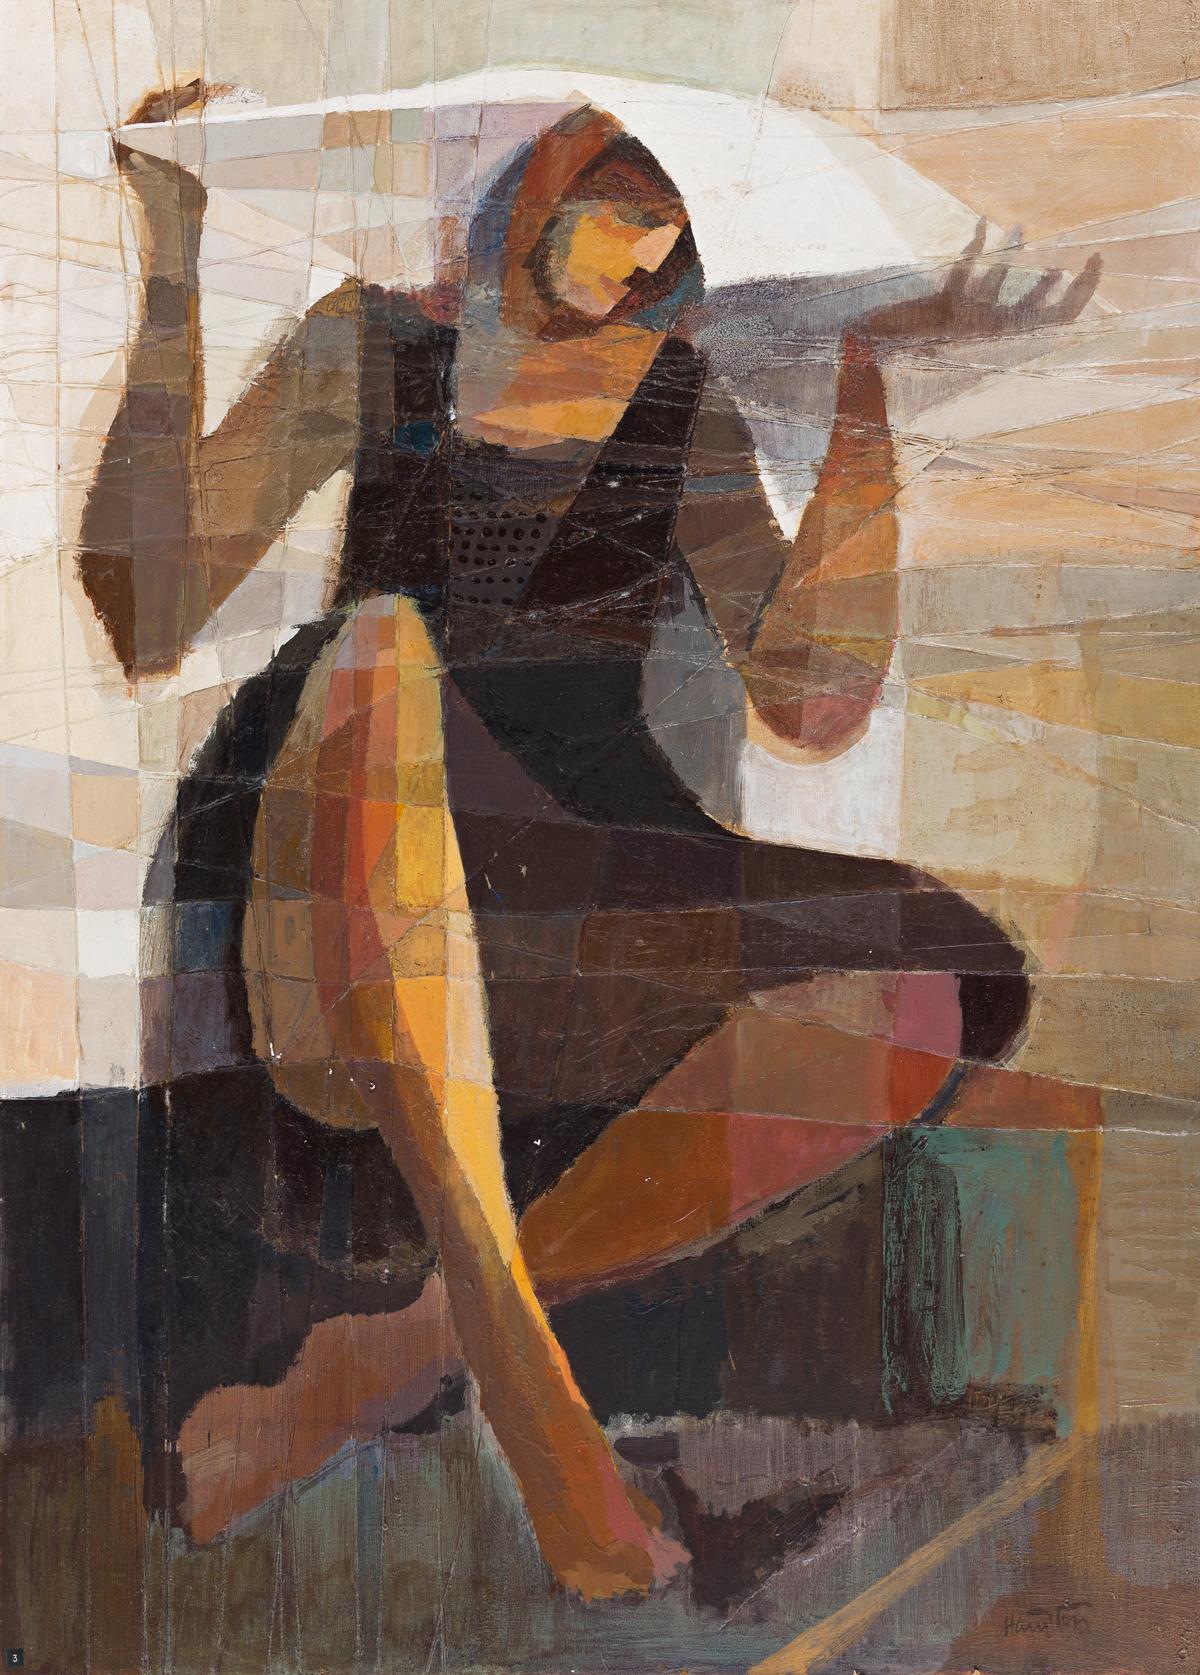 PHILLIP JEWEL HAMPTON (1922 - 2016) Untitled (Woman Covering Her Head).